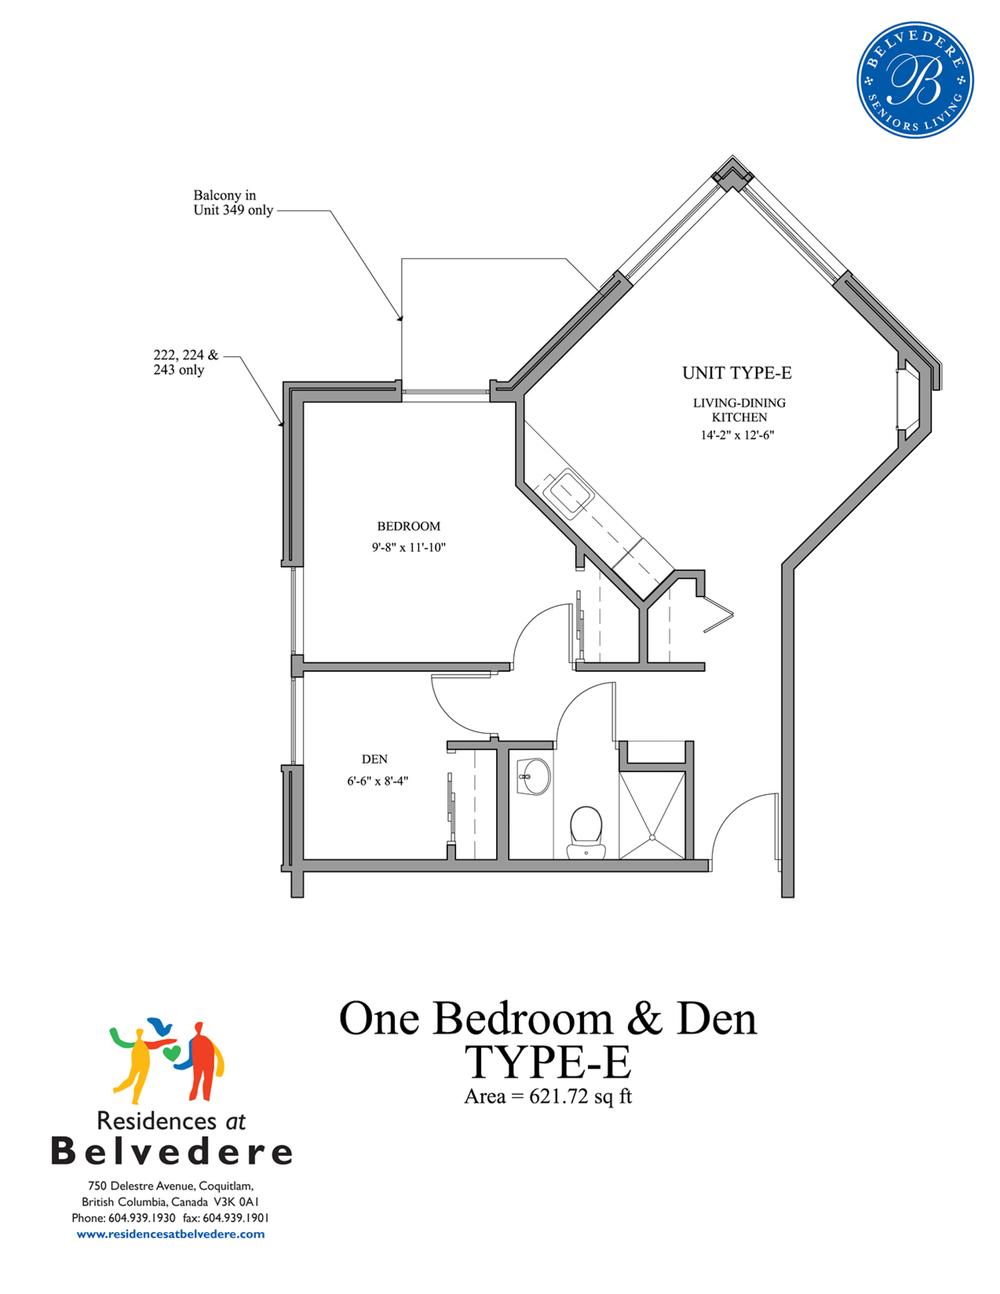 One Bedroom & Den TYPE-E